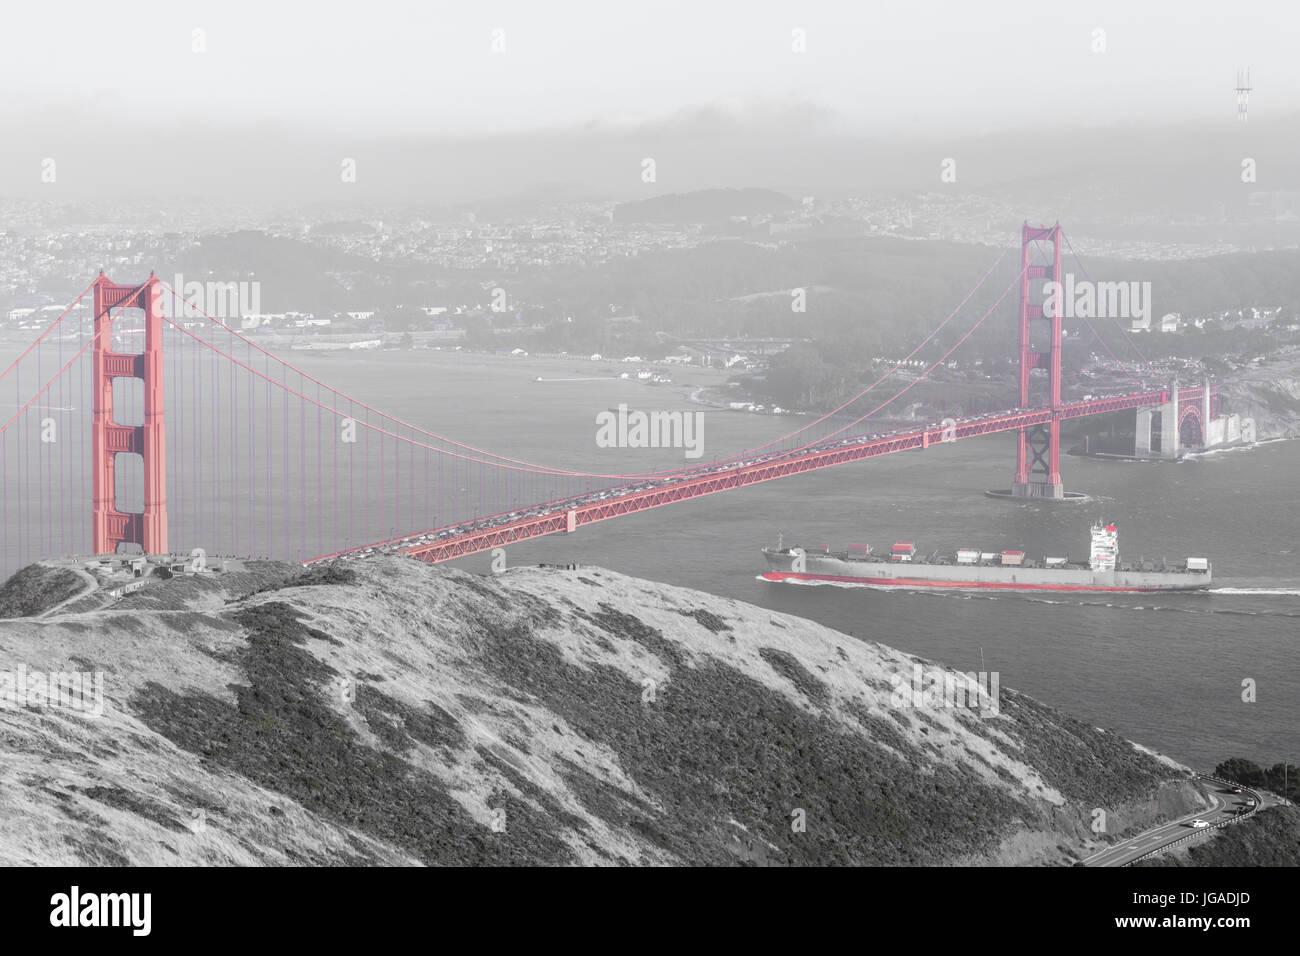 Cargo ship crossing the Golden Gate Bridge. - Stock Image